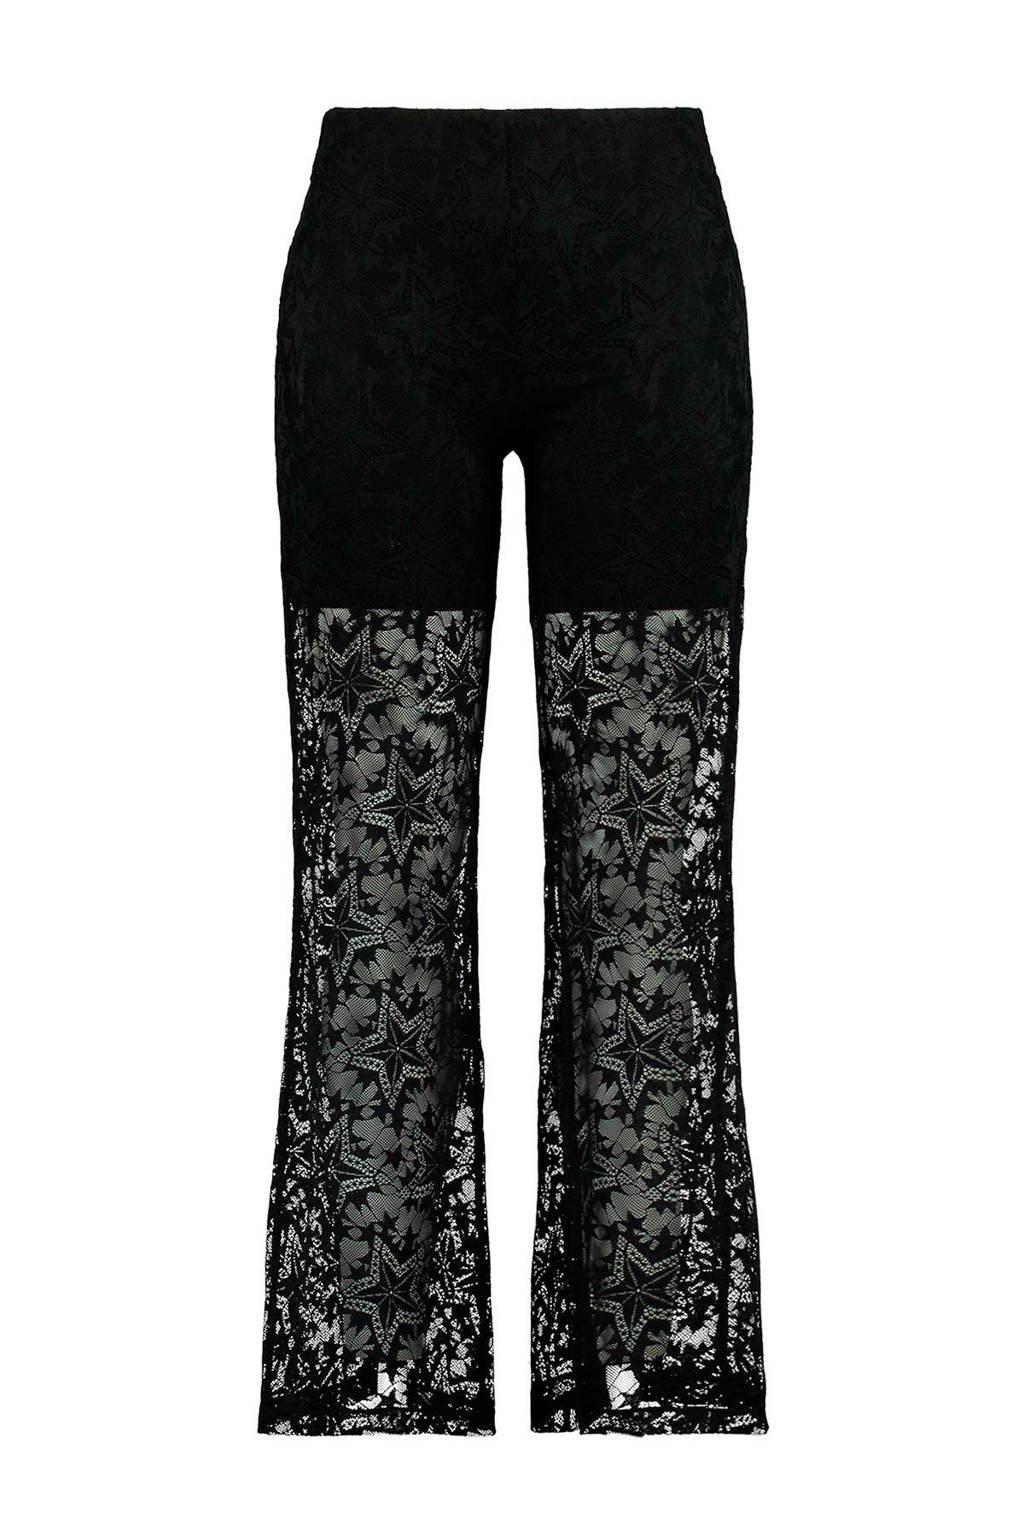 MS Mode flared broek zwart, Zwart